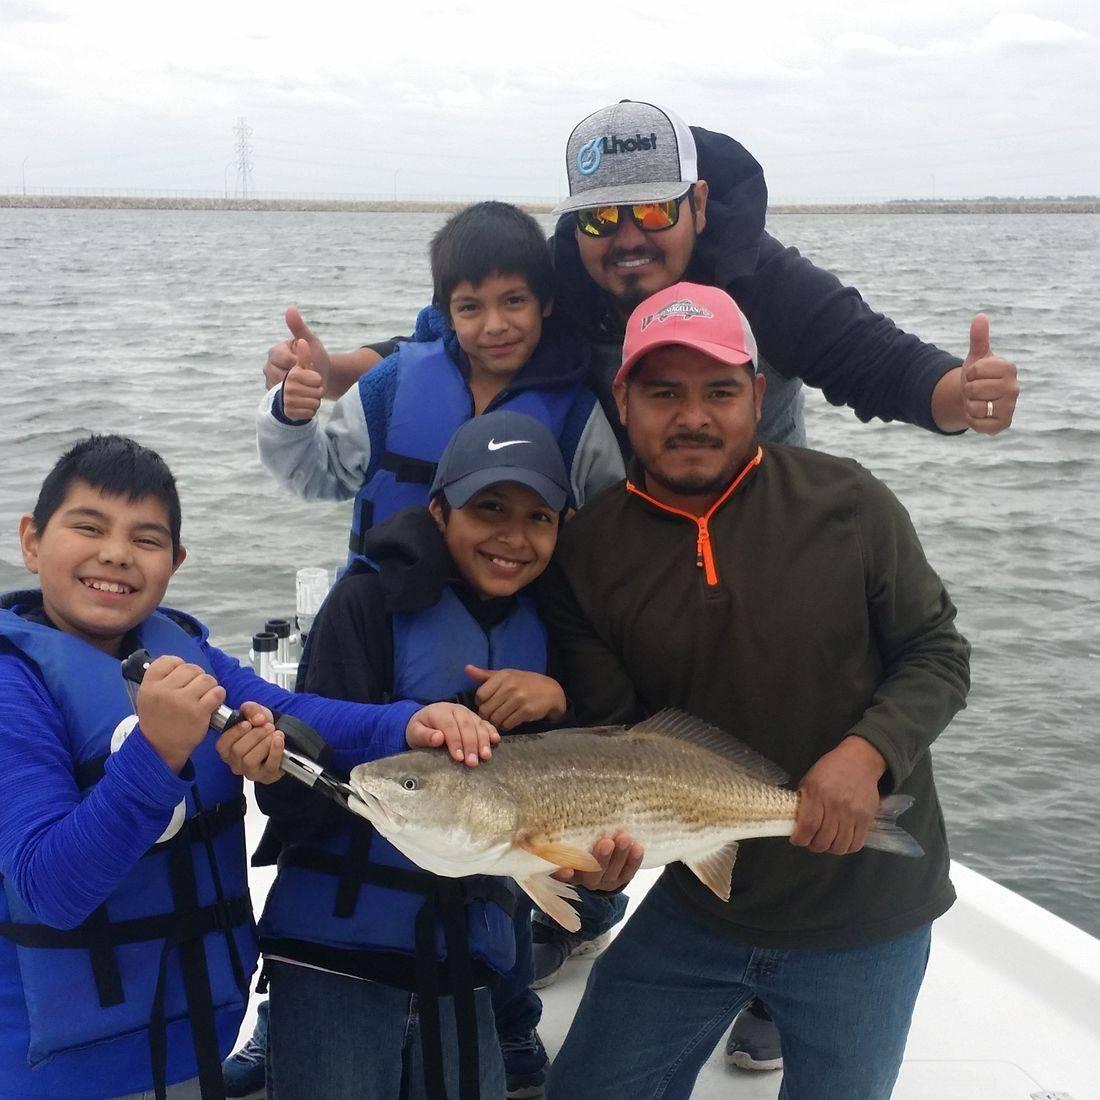 Bones Fishing Guide Service providing some fantastic redfish fishing. San Antonio offers some amazing at Brauning Lake, Calaveras Lake and Canyon Lake.